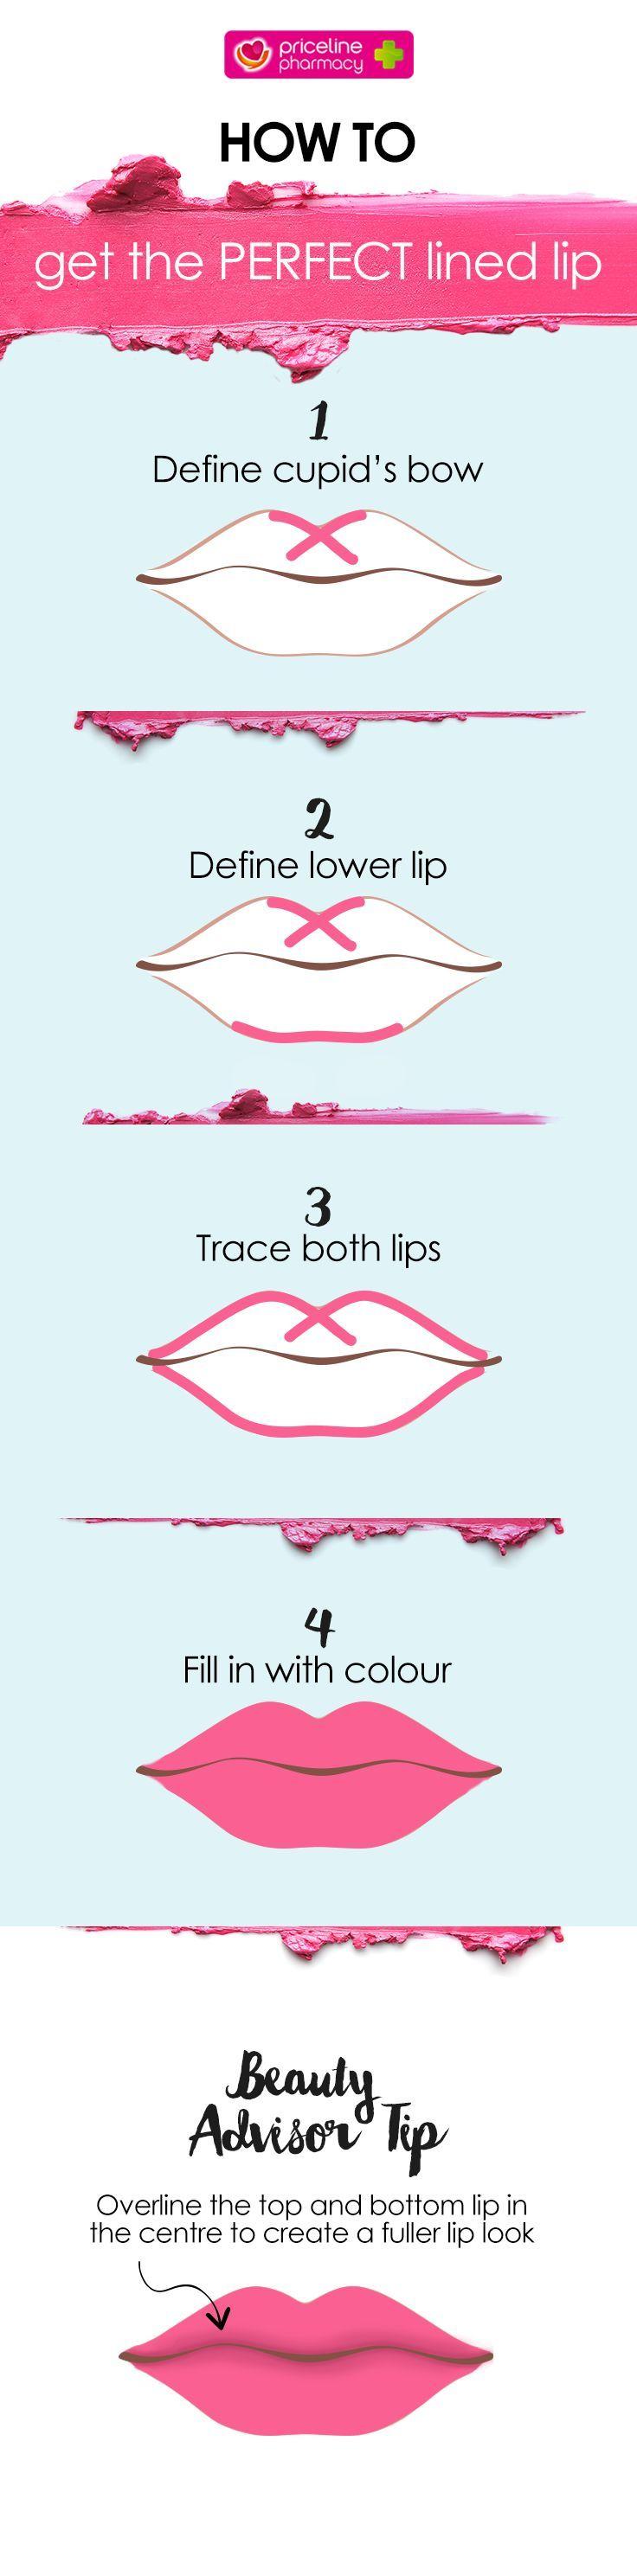 Lip lining 101